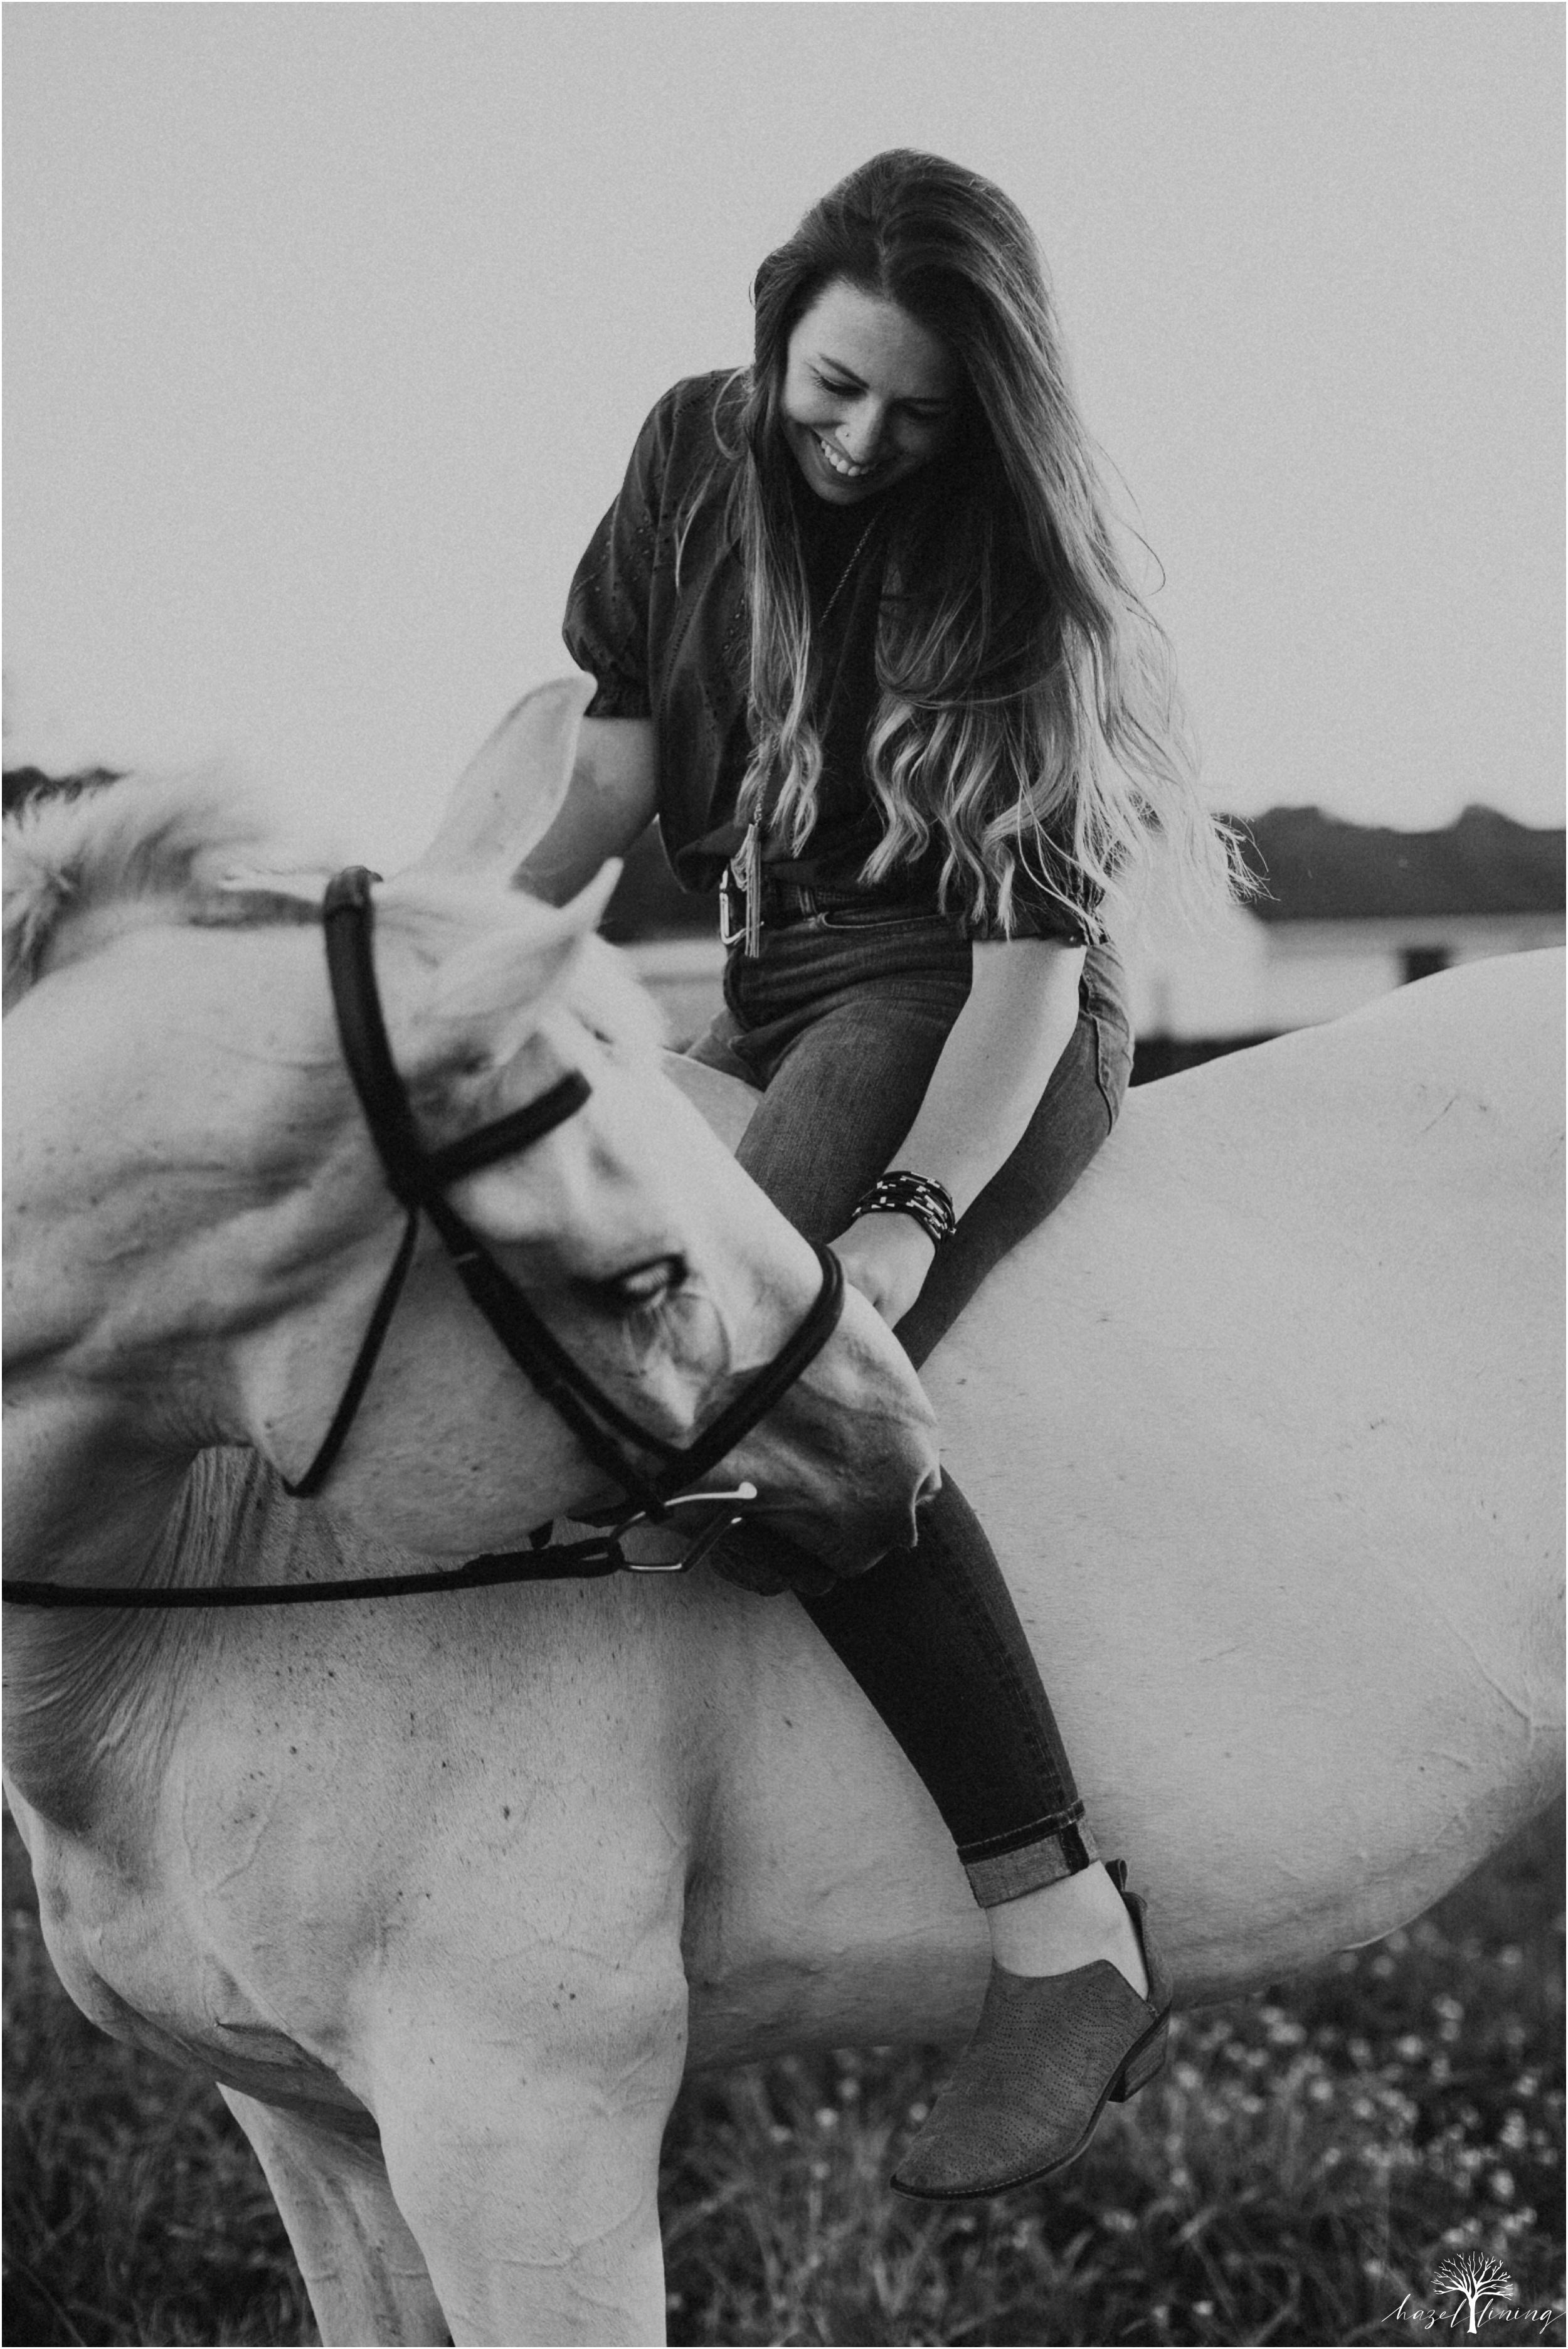 taylor-adams-and-horse-delaware-valley-university-delval-summer-equestrian-portrait-session-hazel-lining-photography-destination-elopement-wedding-engagement-photography_0037.jpg